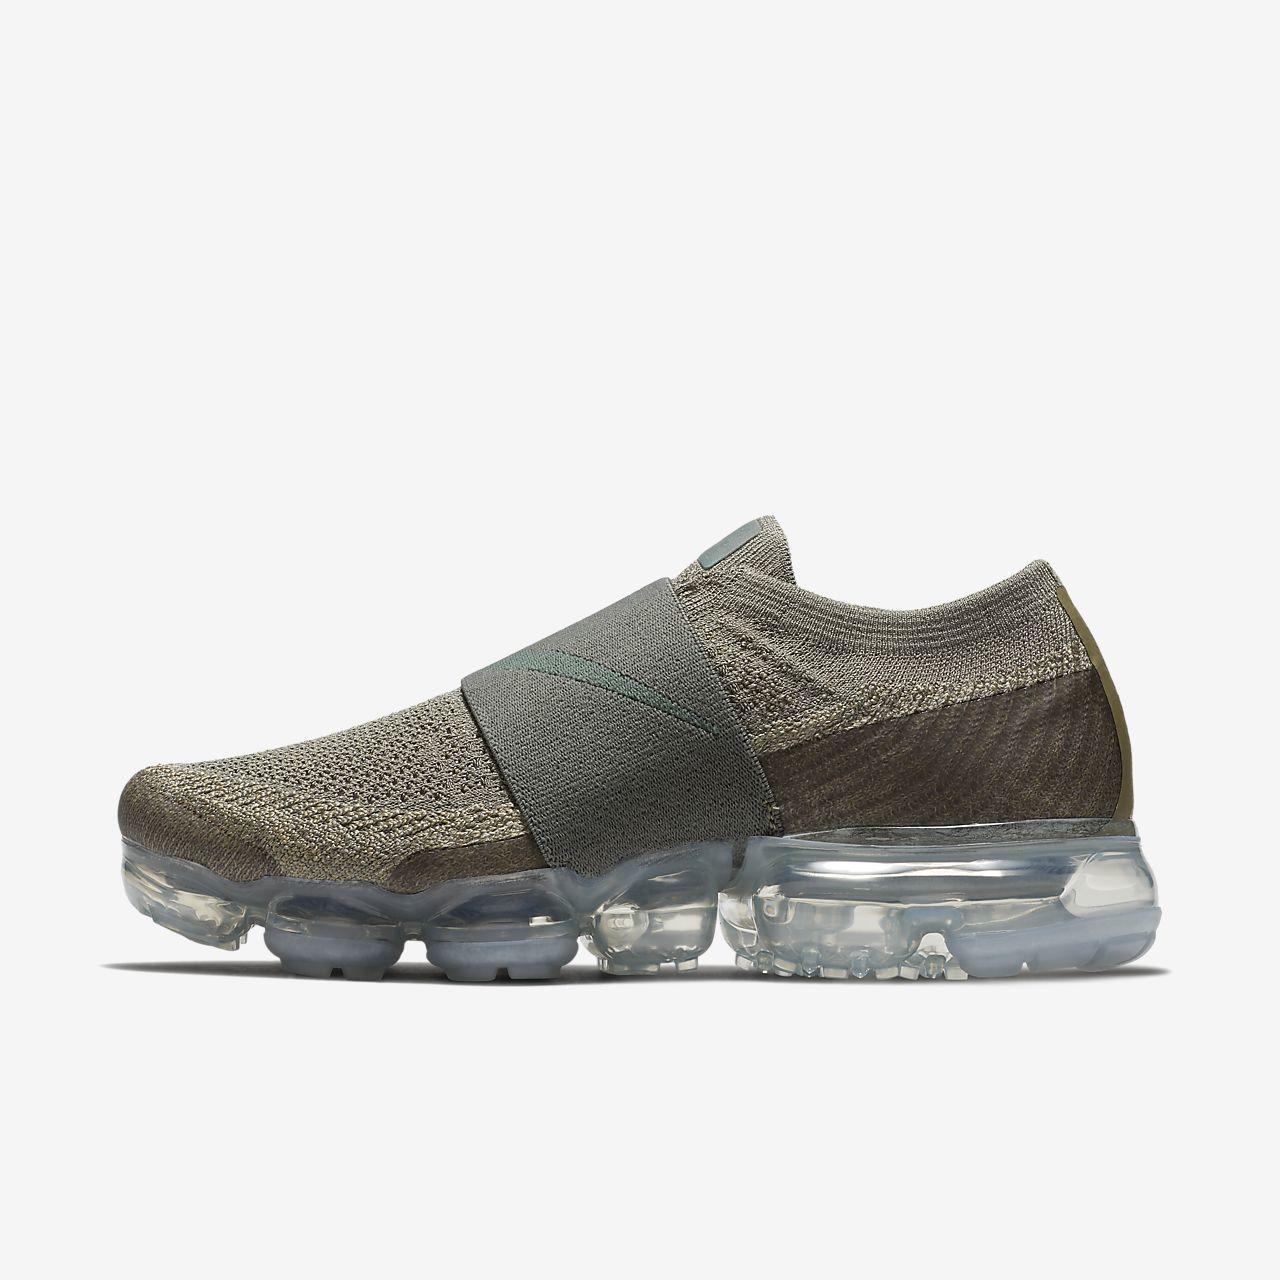 6feab61a9a8 Nike Air VaporMax Flyknit Moc Women s Running Shoe